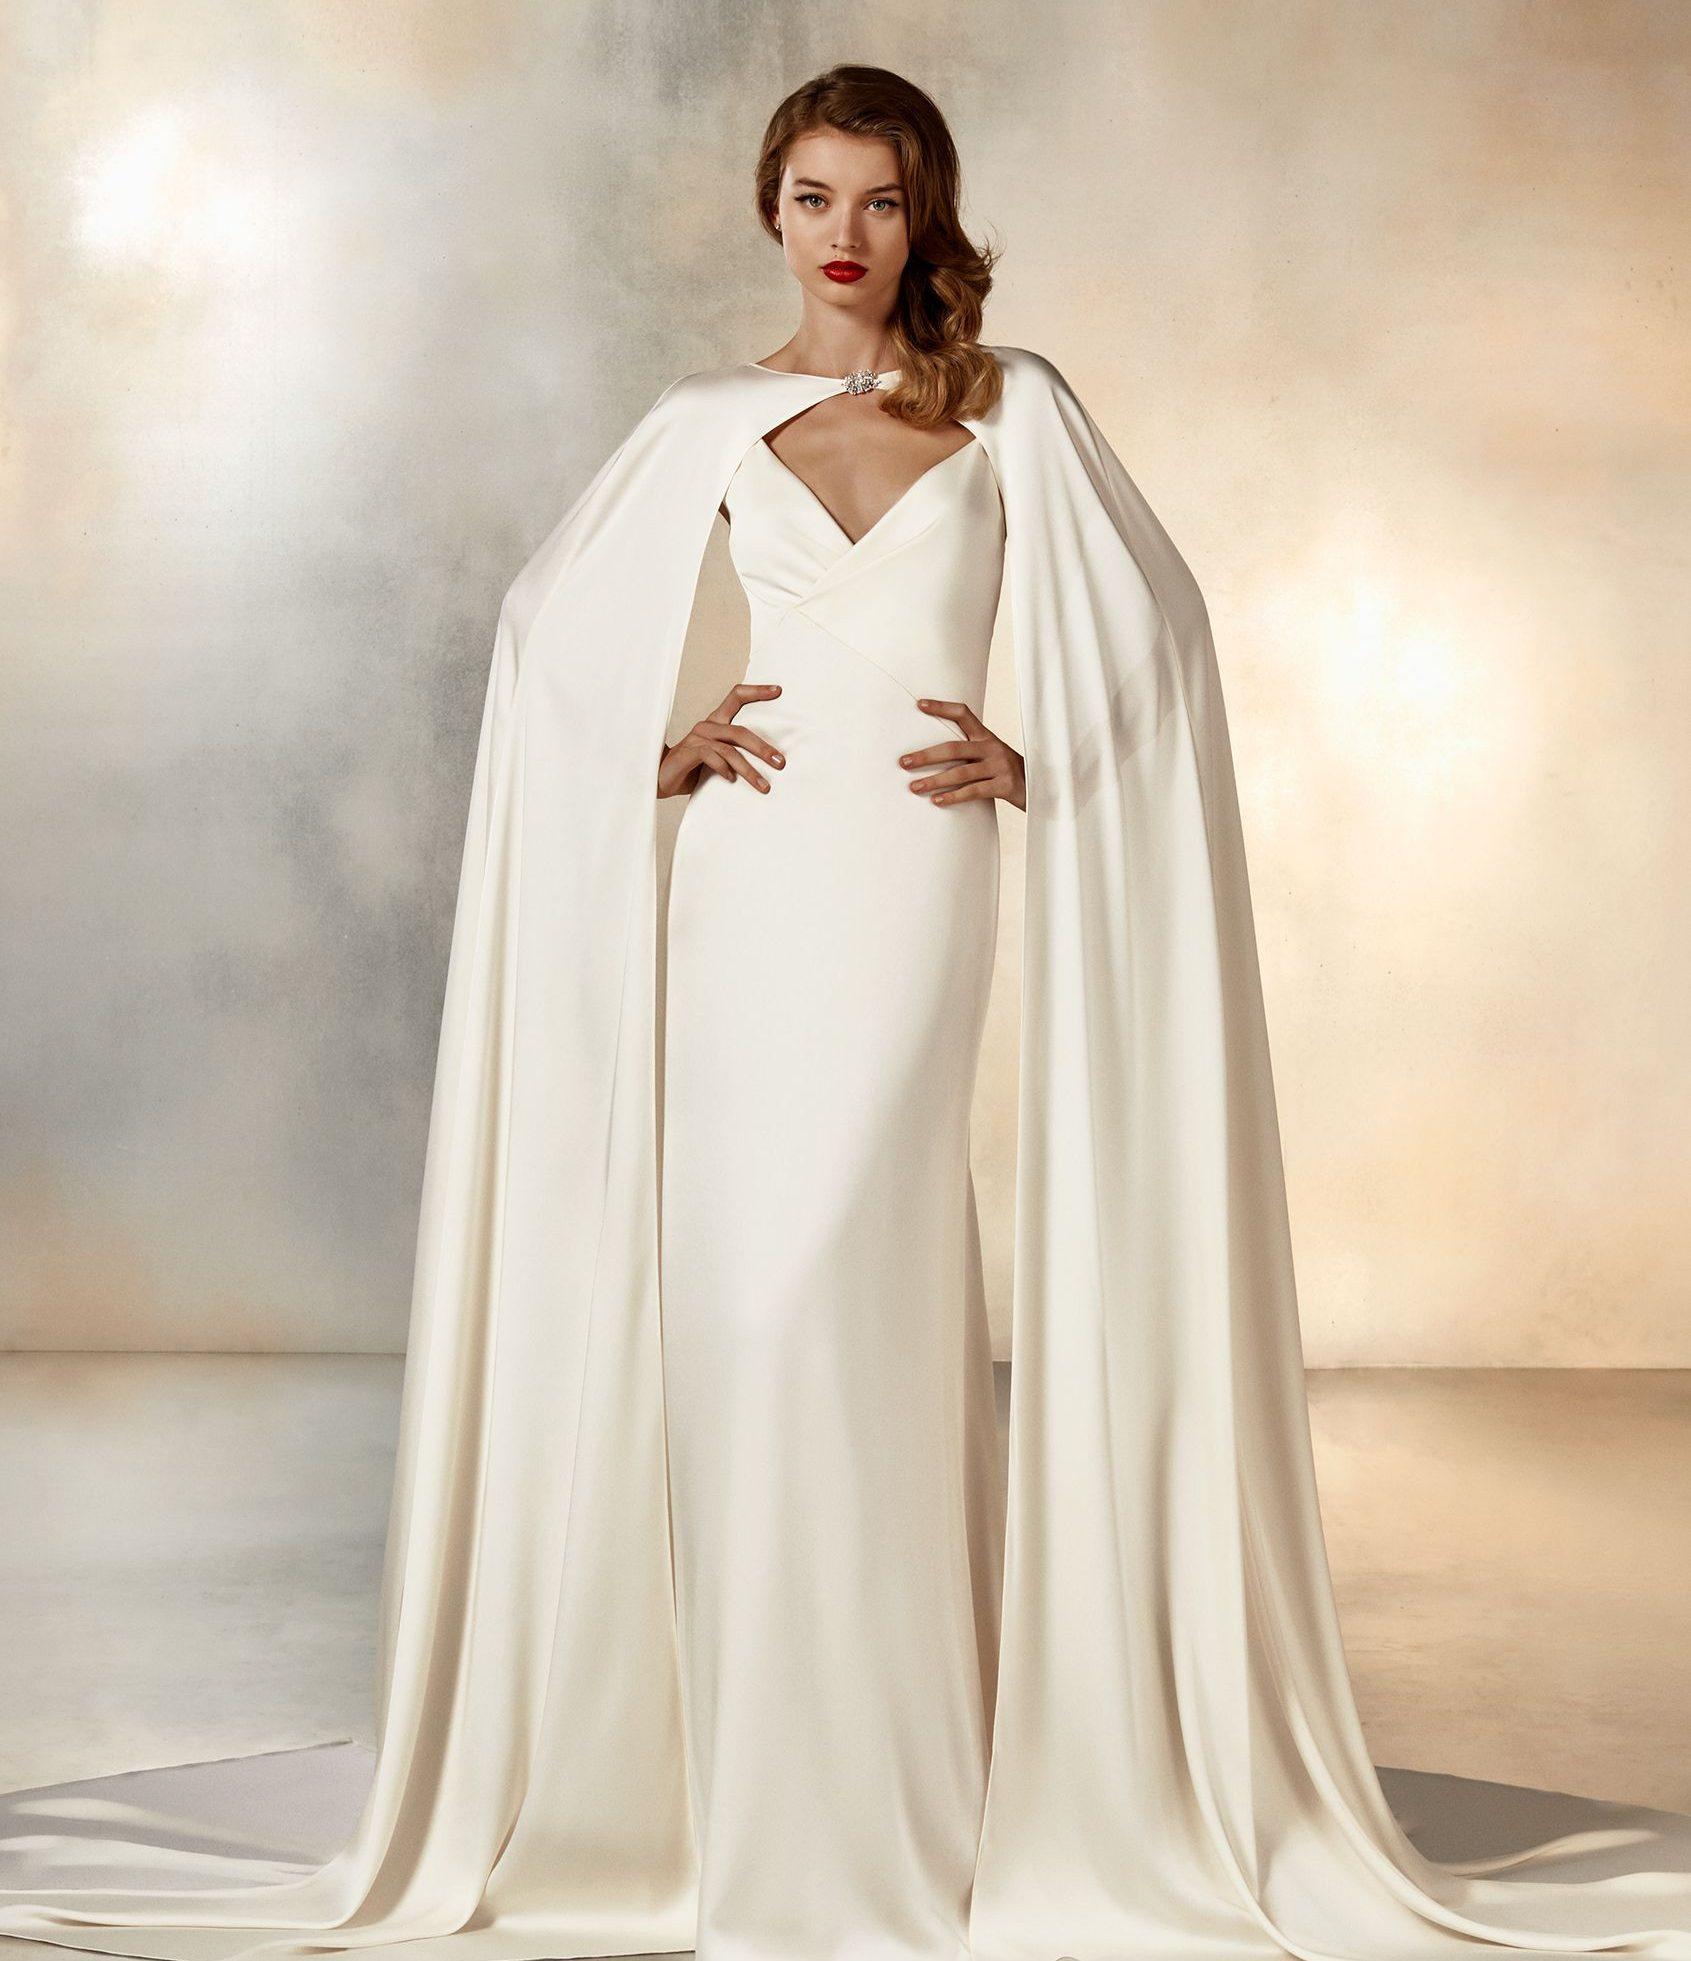 Pronovias Moonlight Wedding Dress & Cape